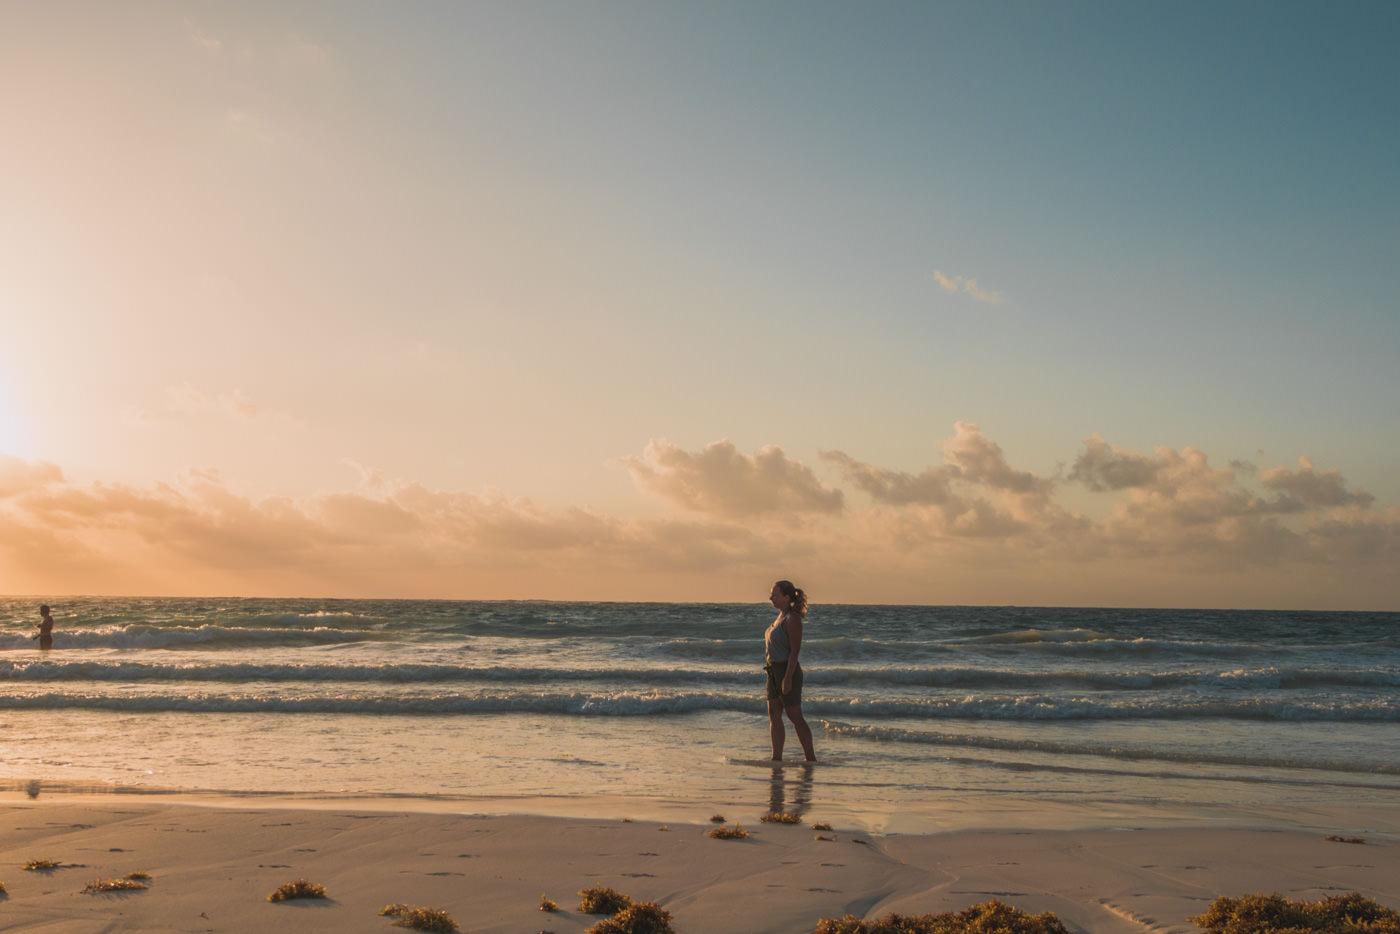 Julia im Meer während des Sonnenaufgangs